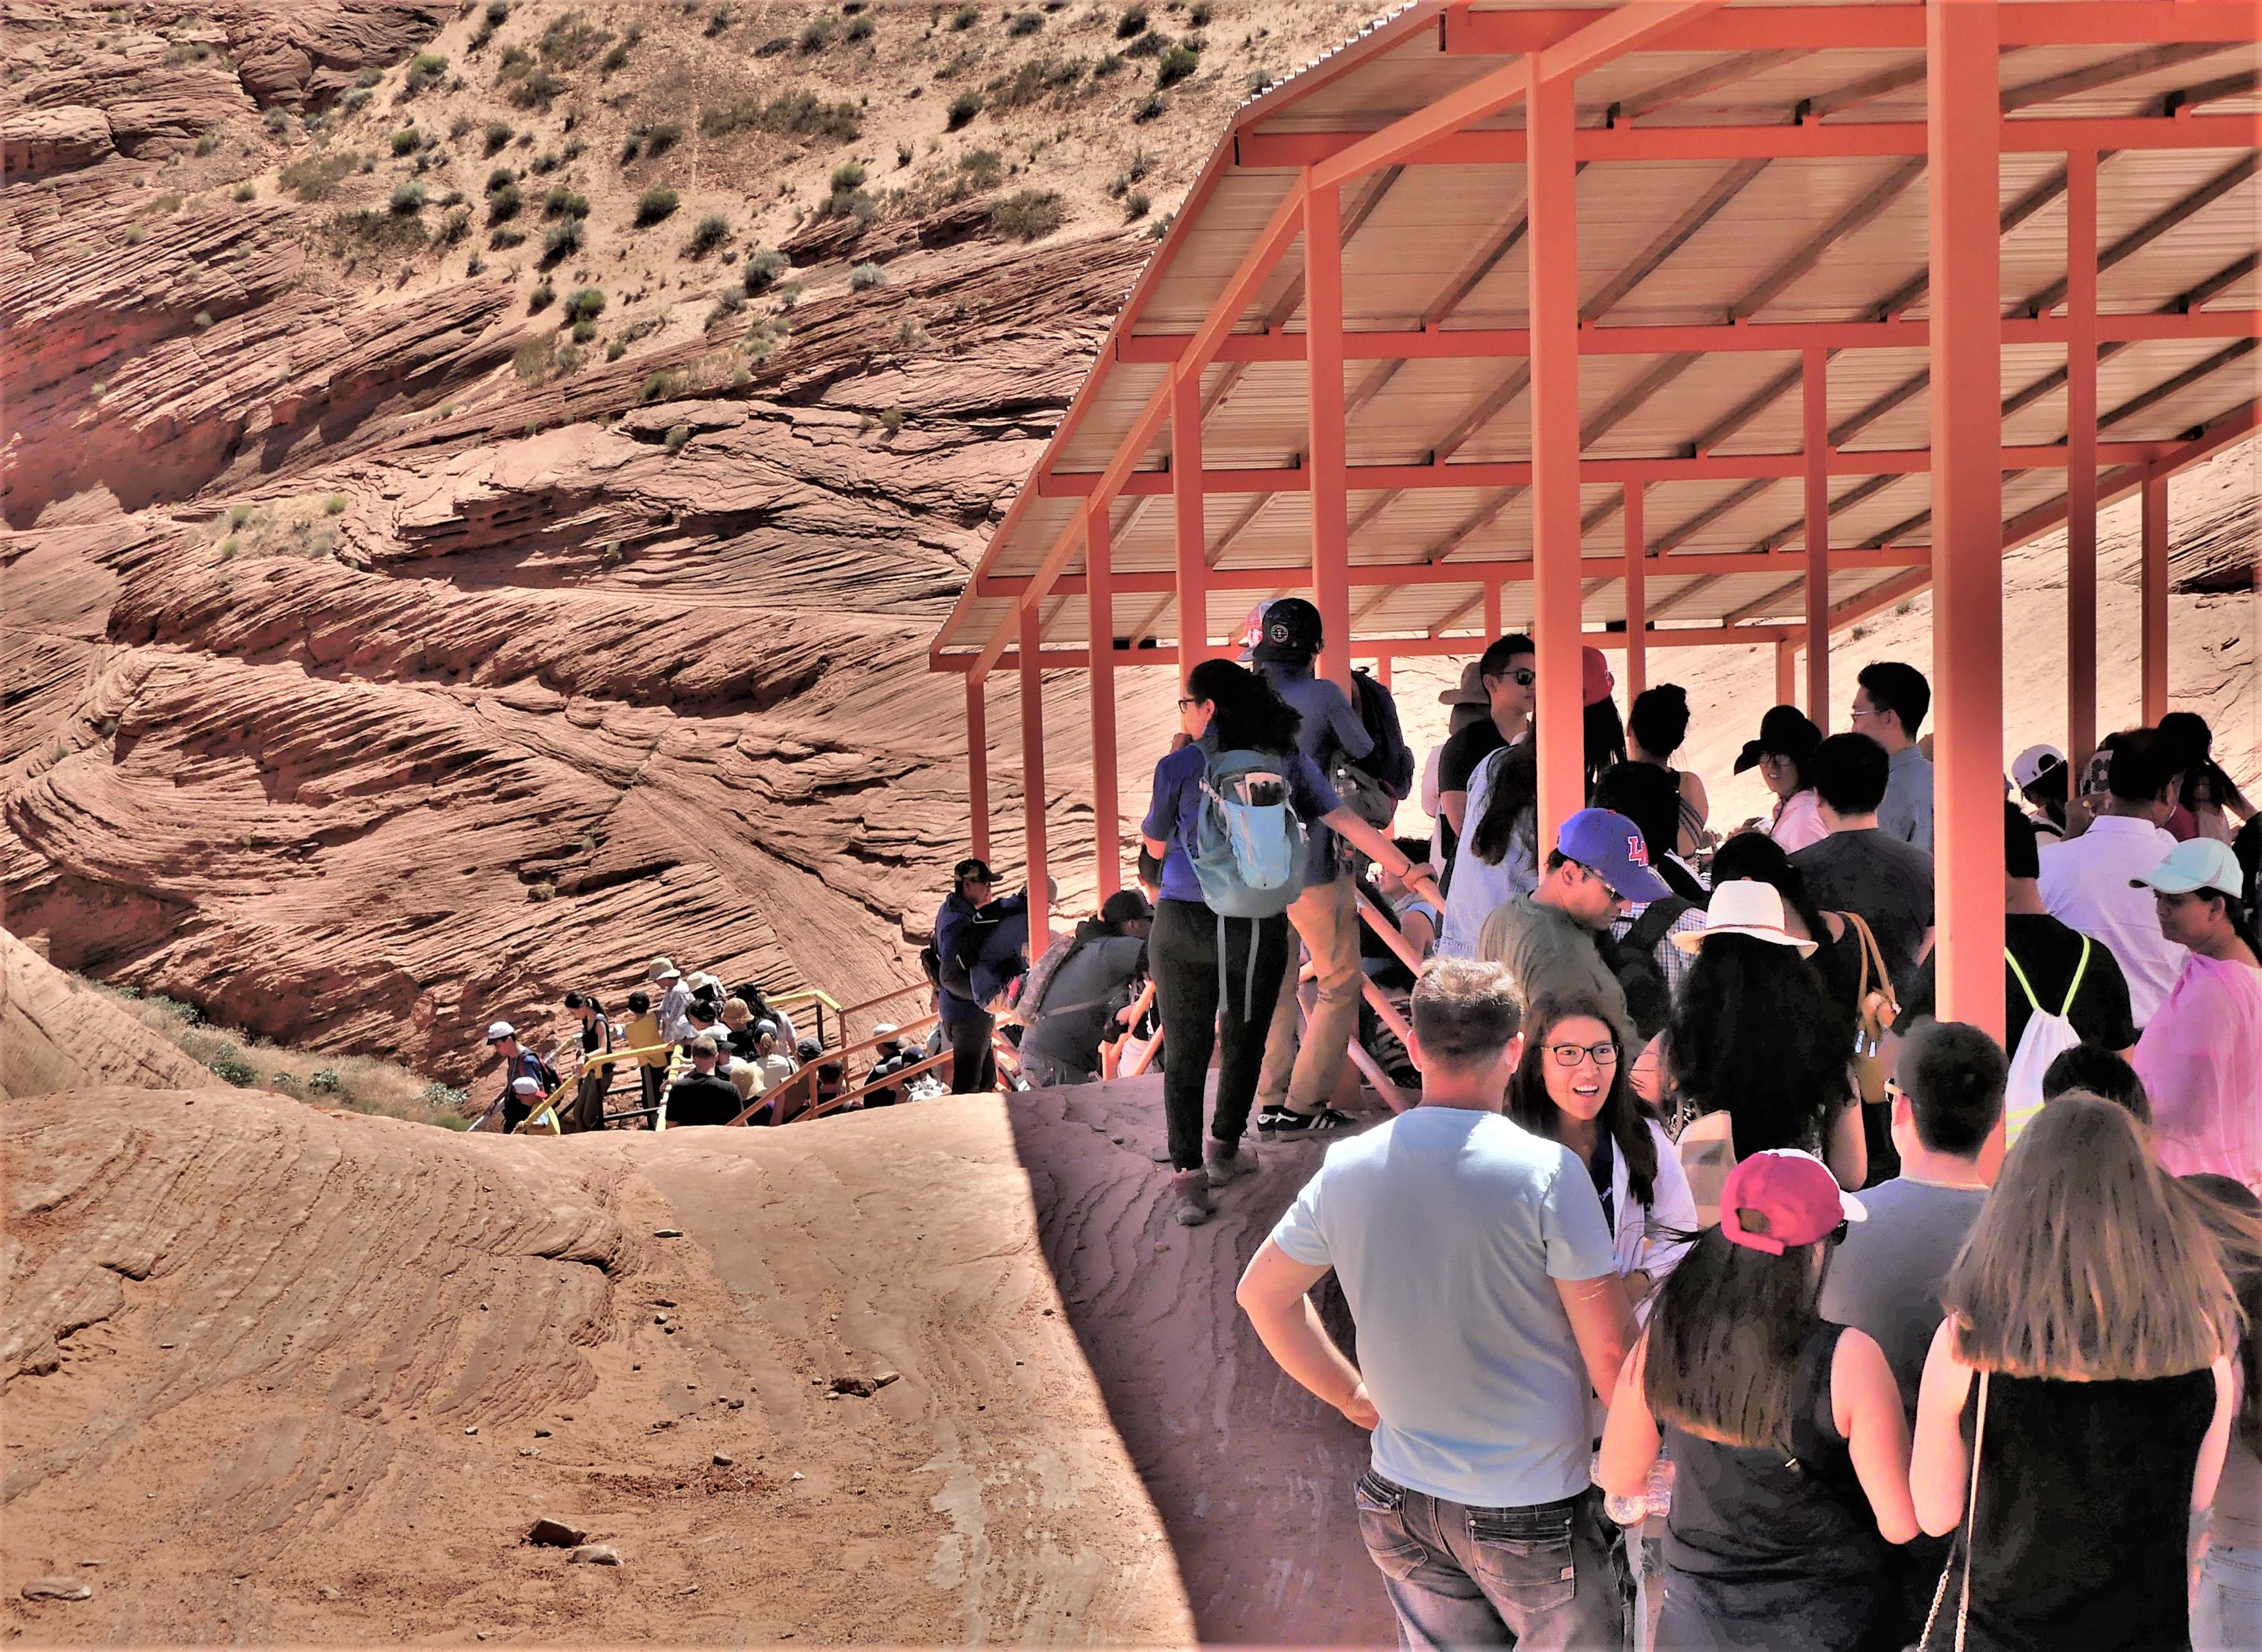 Descending Lower Antelope Canyon trail